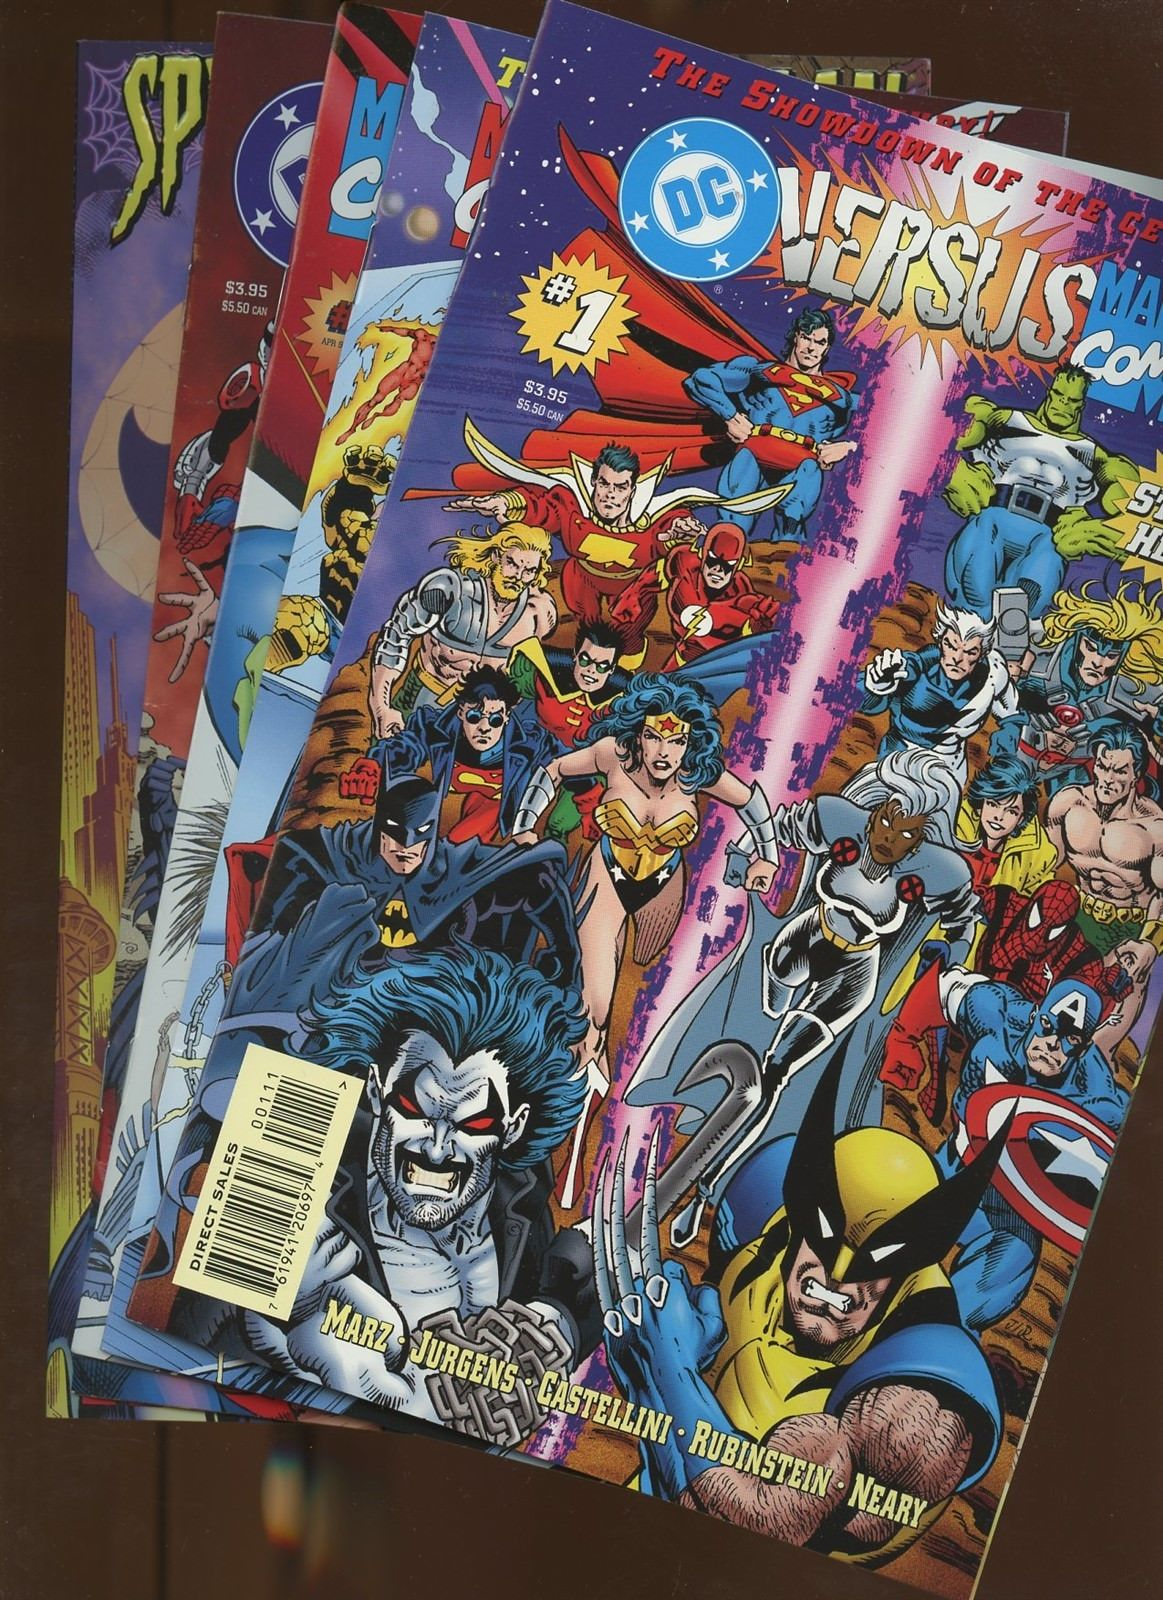 DC Versus Marvel/Marvel Versus DC 1,2,3,4 Spider-Man and Batman   5 Book Lot *